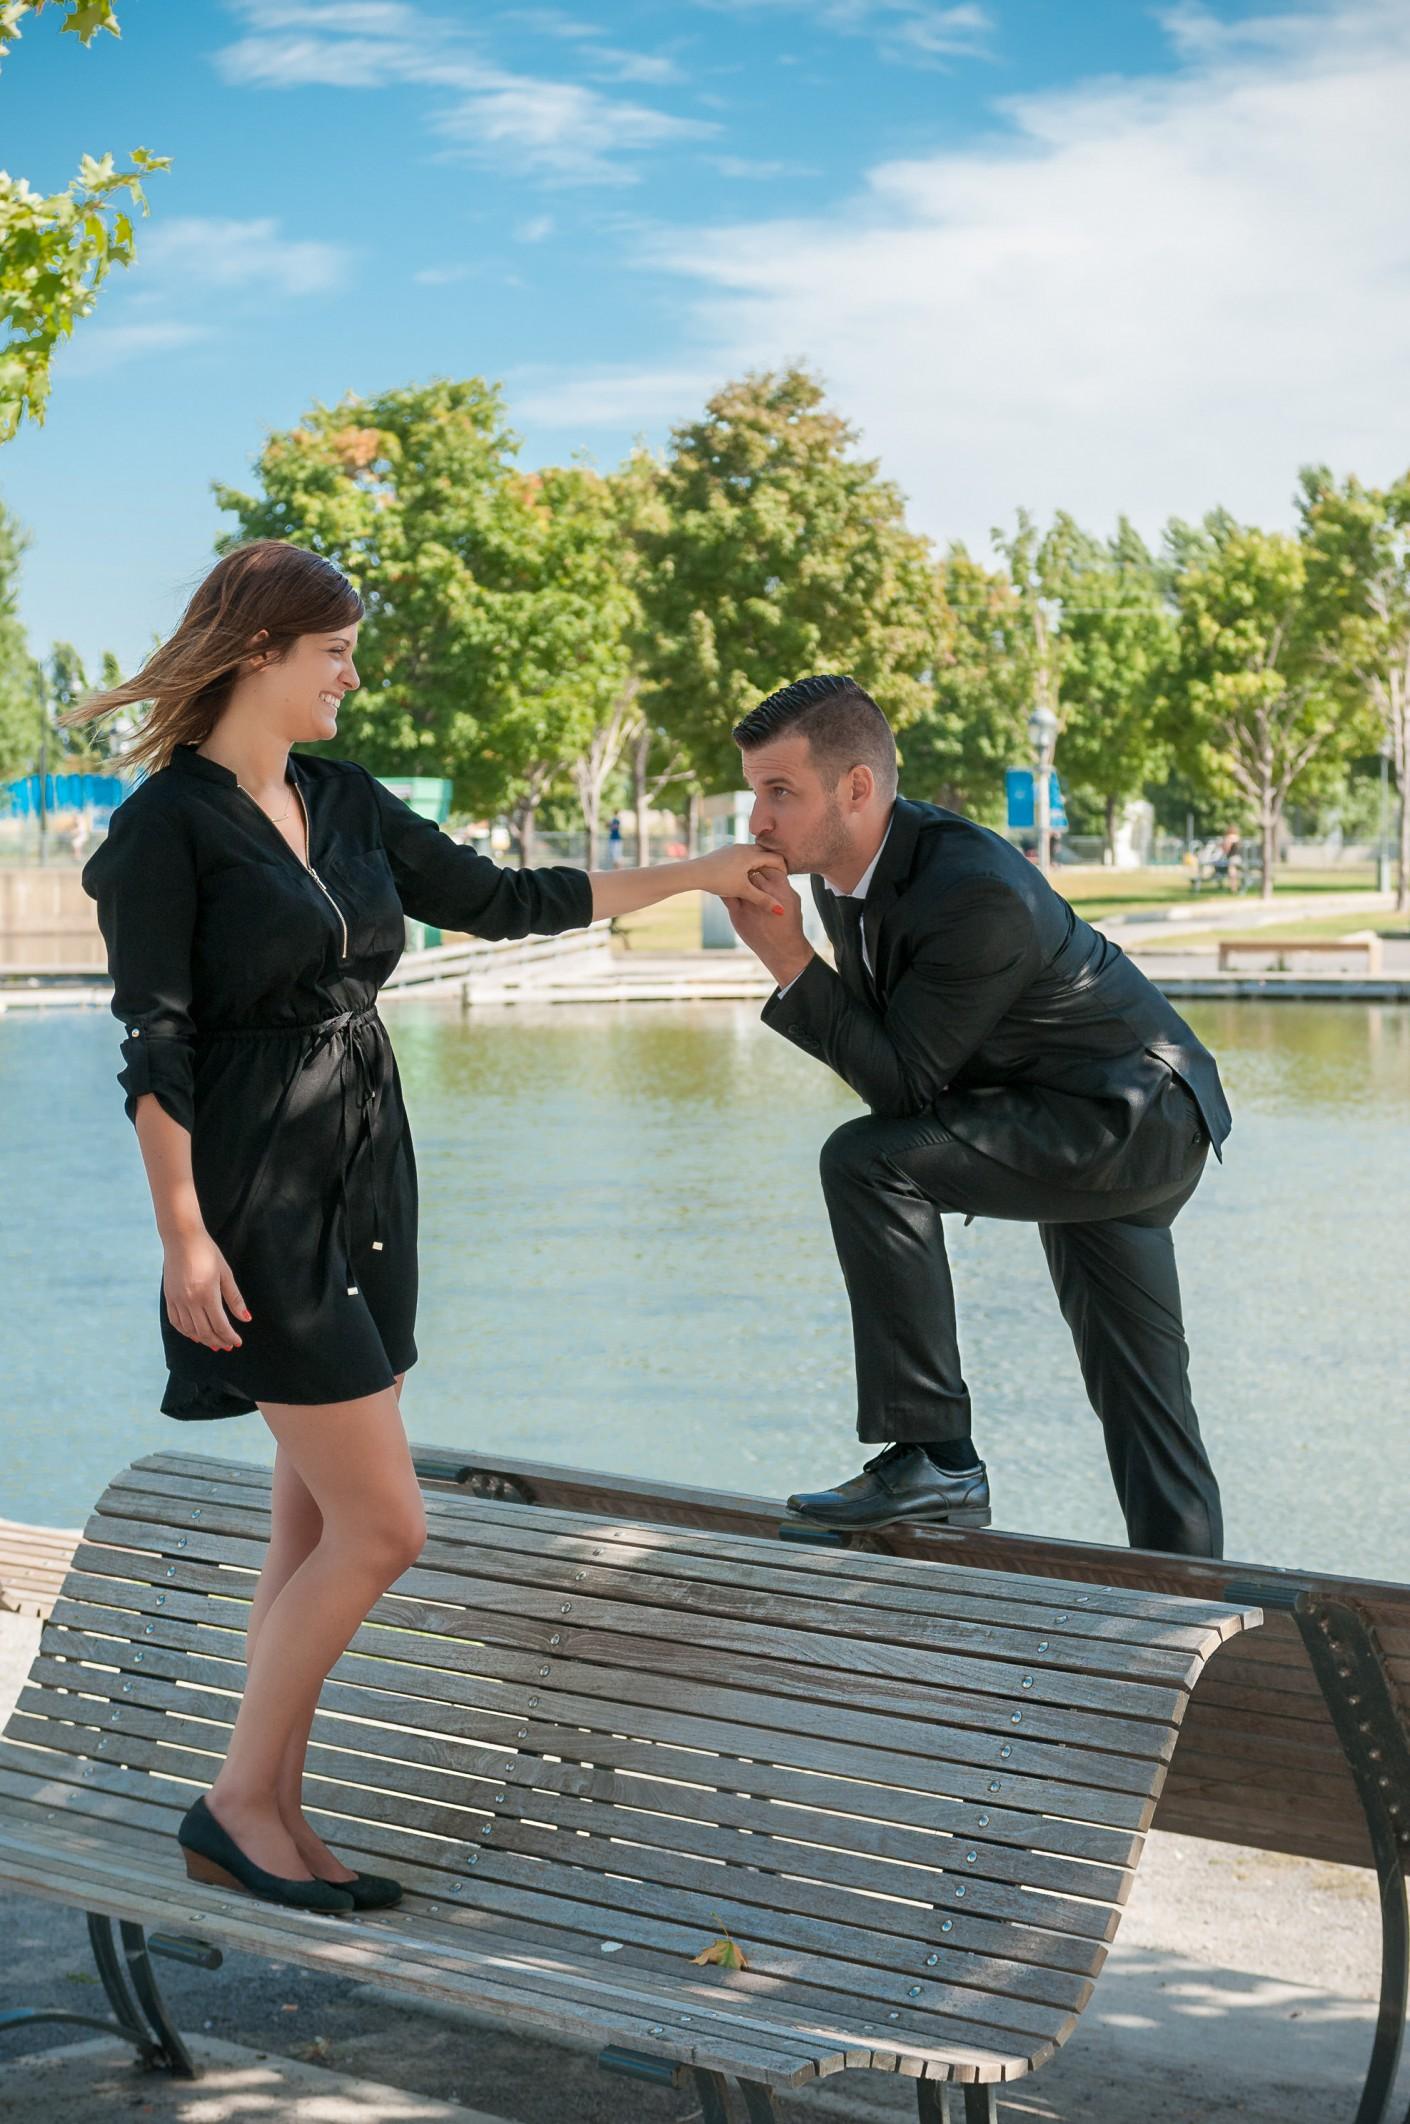 Fiancailles : Galanterie -, KW: Engagement, Mariage